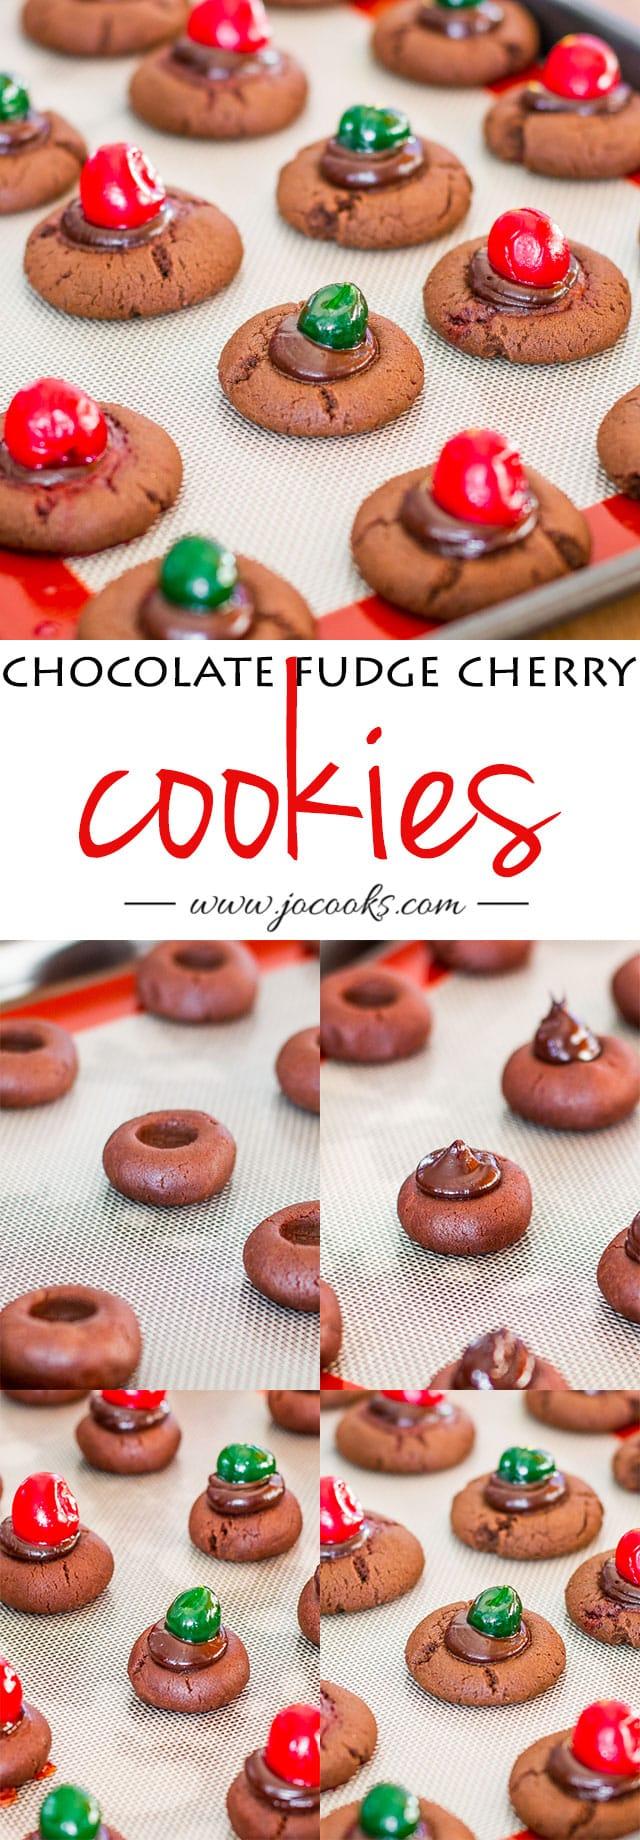 chocolate-fudge-cherry-cookies-collage